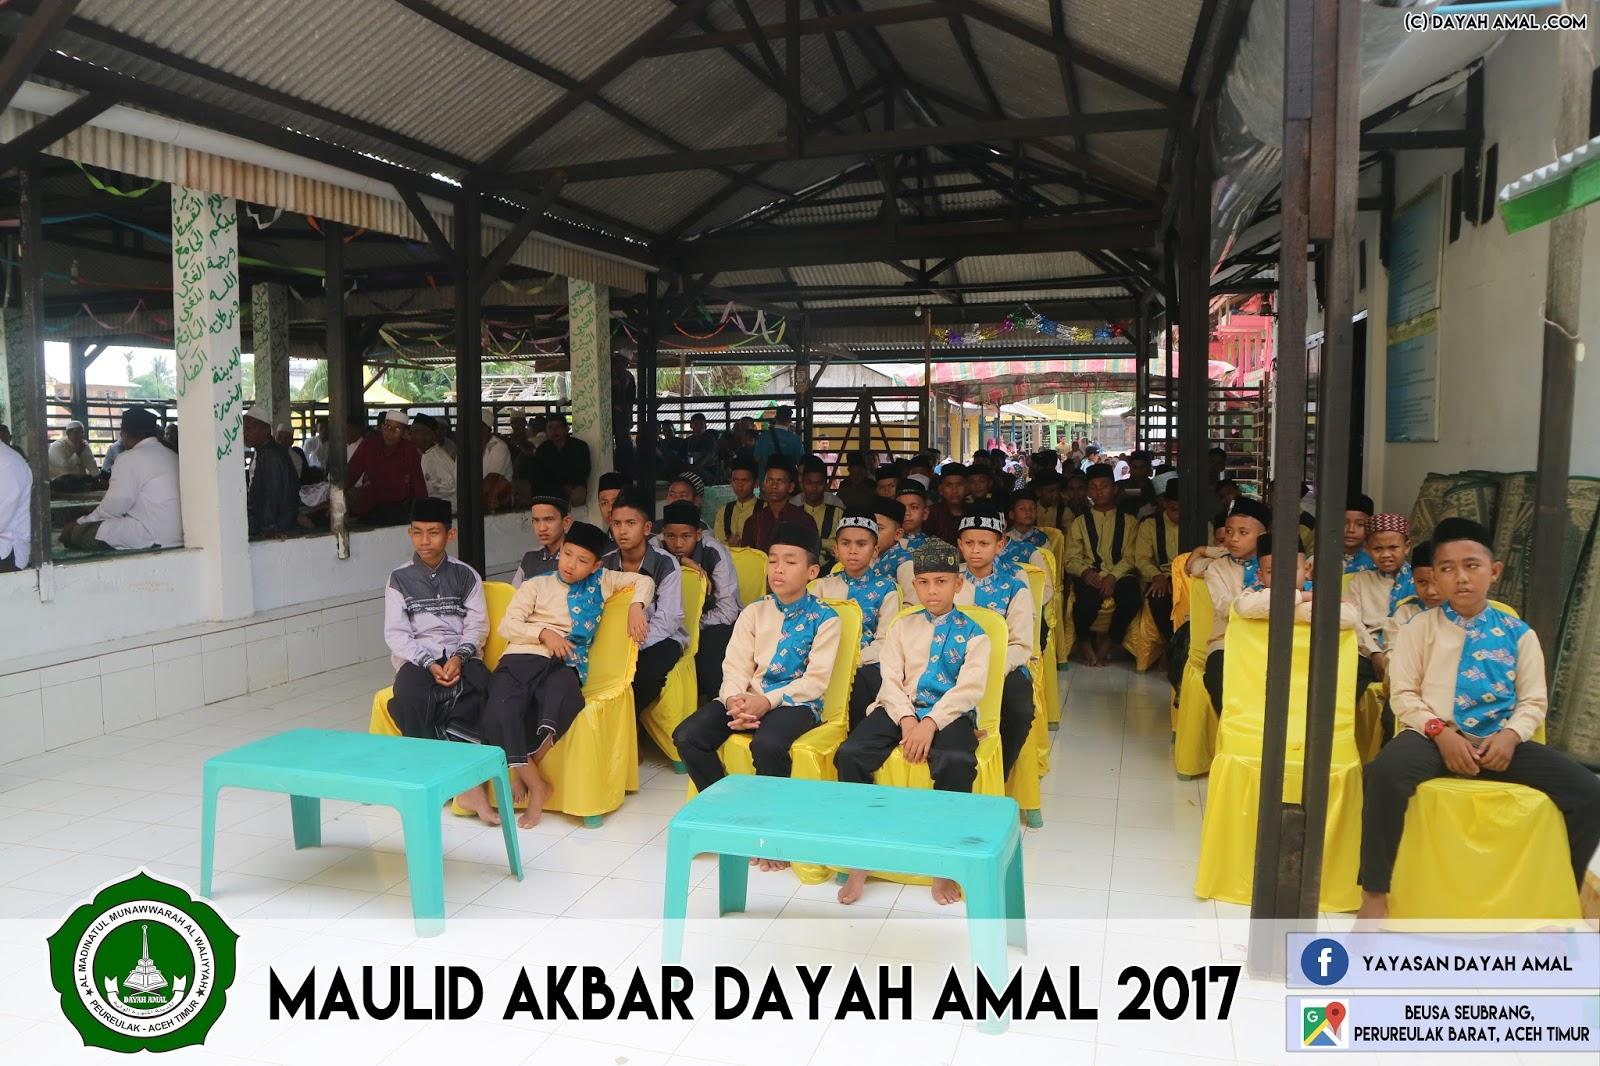 Maulid Akbar Dayah AMAL 2017